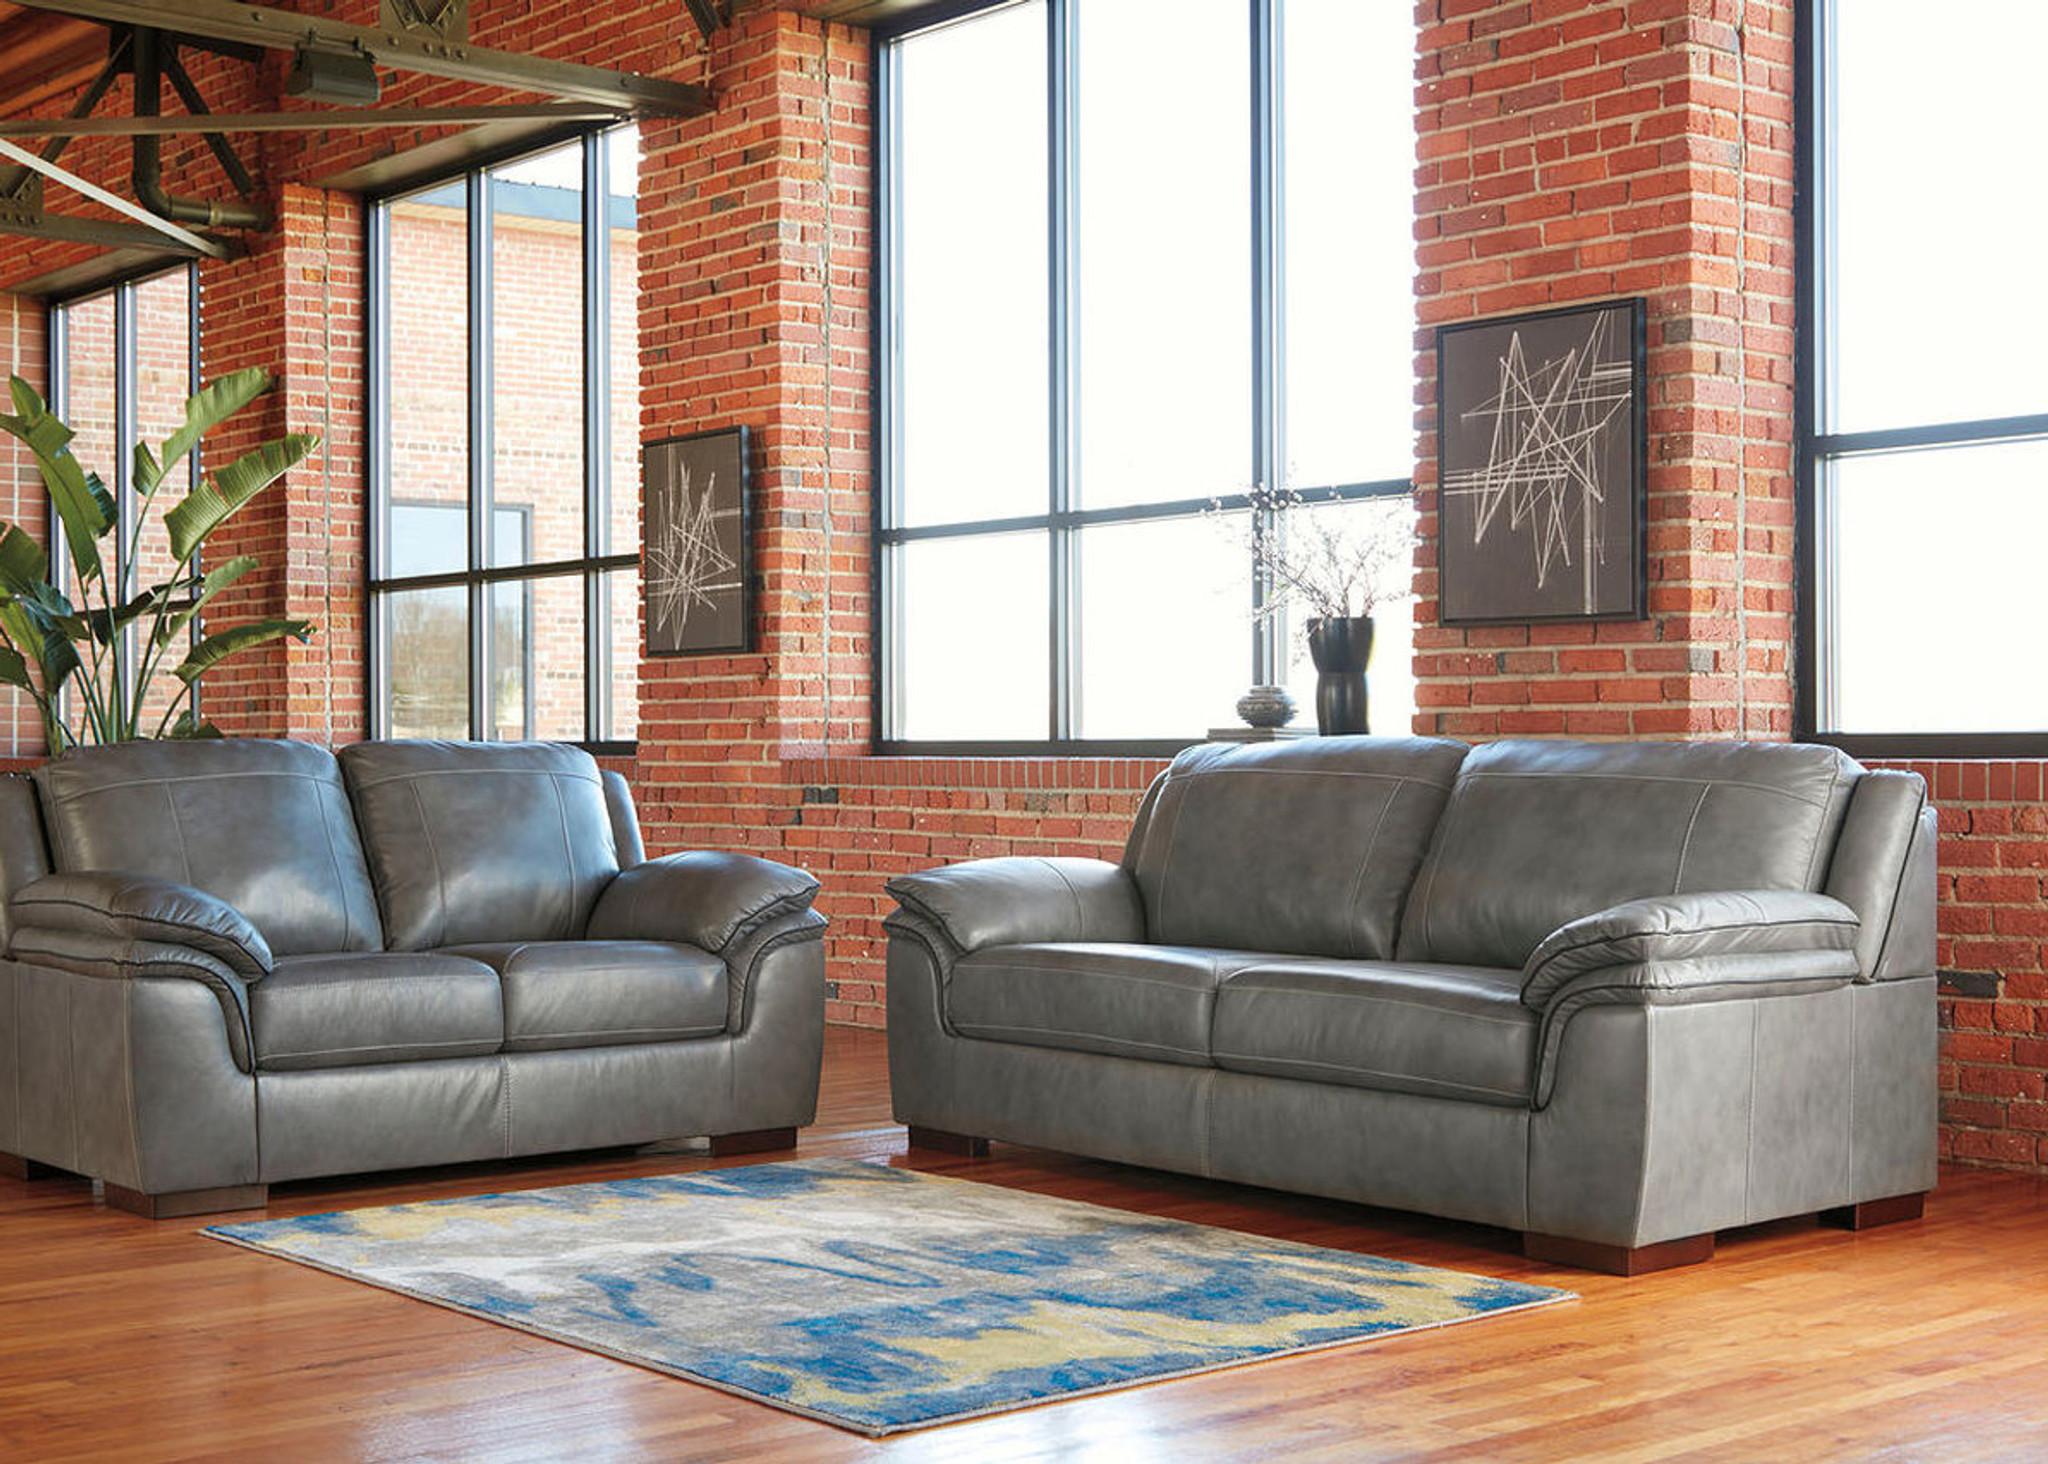 Fabulous 2 Pcs Islebrook Iron Leather Sofa Loveseat Spiritservingveterans Wood Chair Design Ideas Spiritservingveteransorg